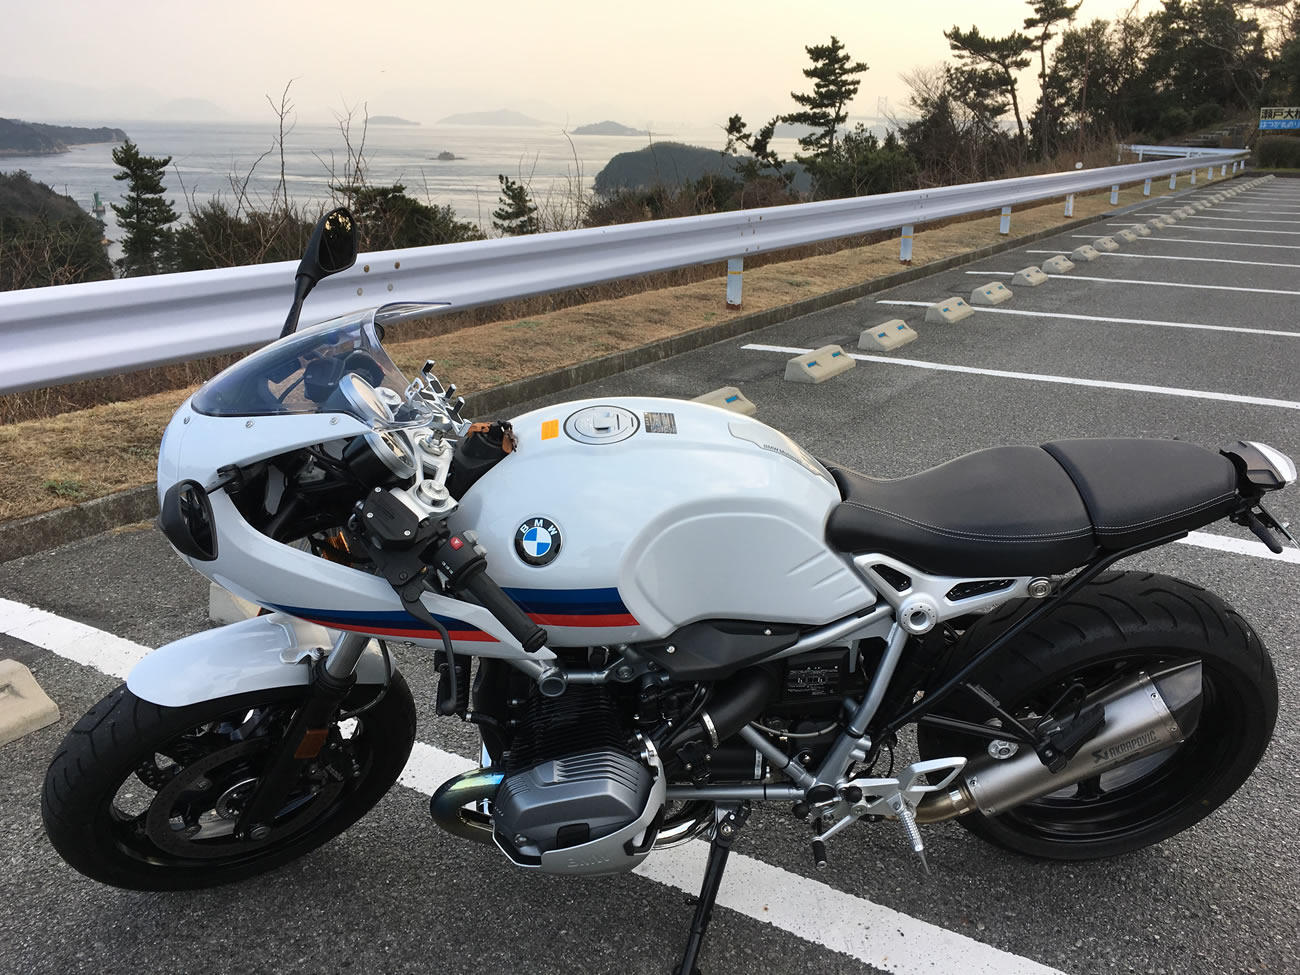 BMWのR nineT racerのタンデムシート